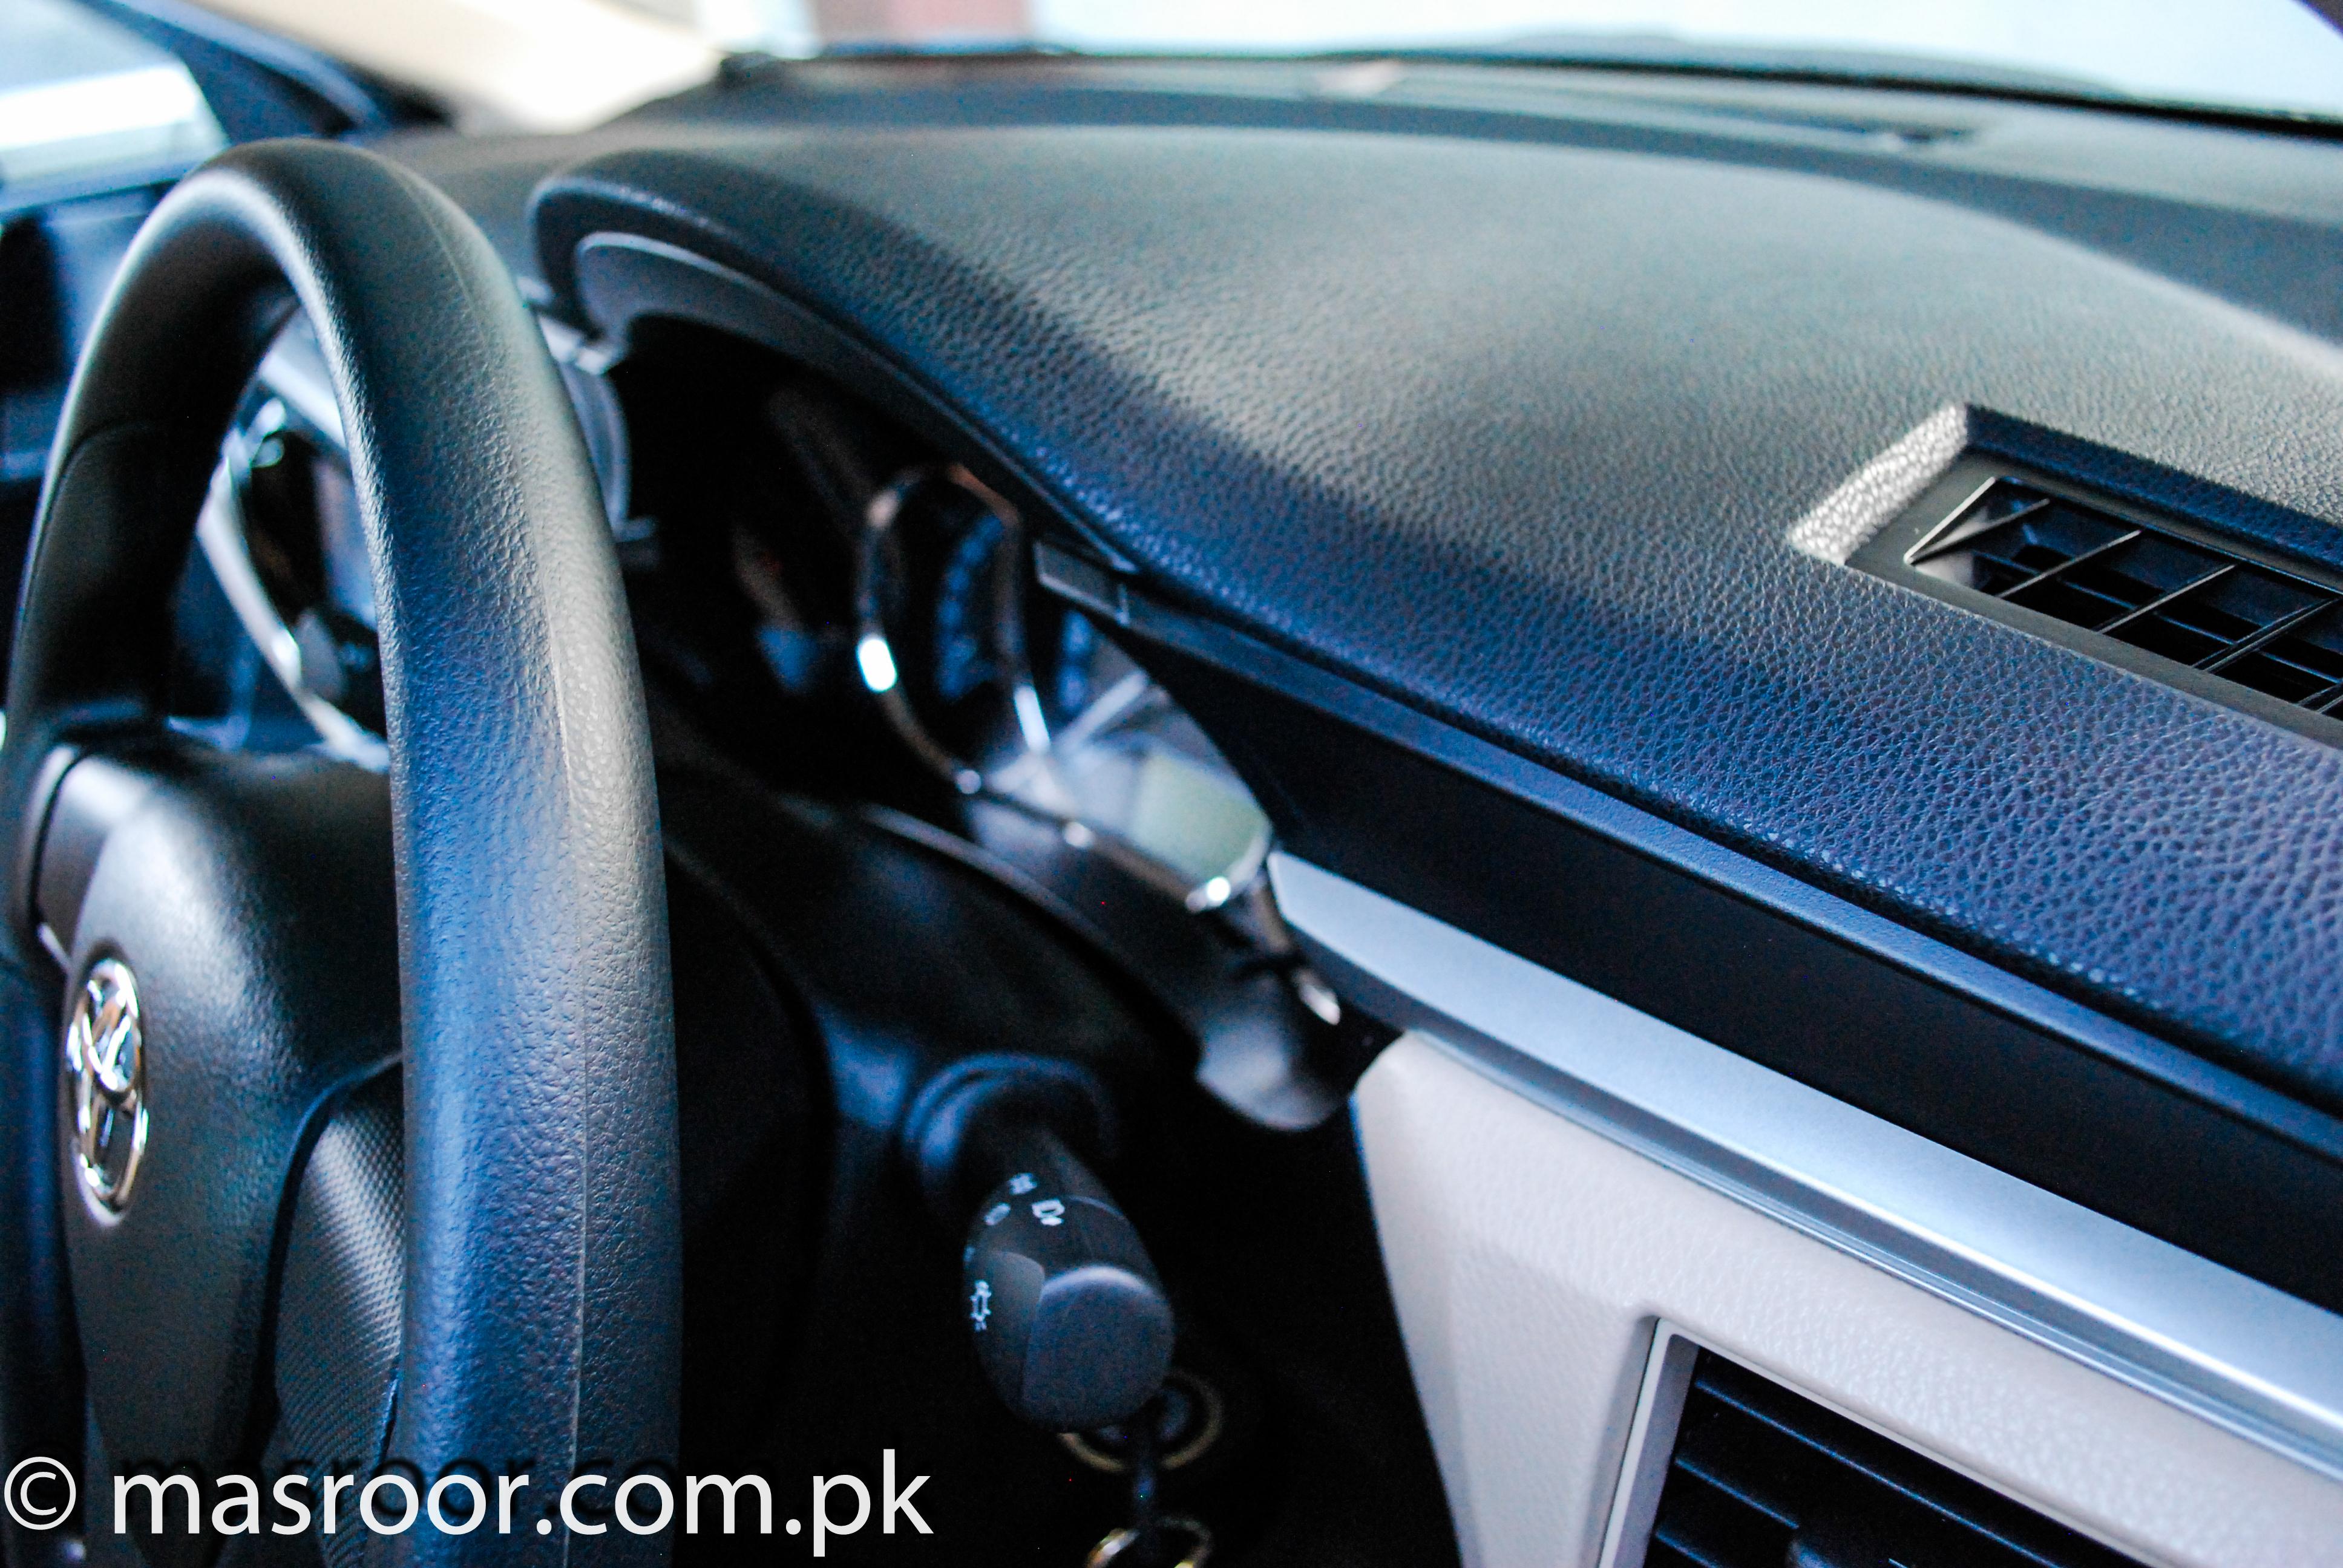 11th Generation Toyota Corolla Pakistan - 17647416013 7316354a99 o